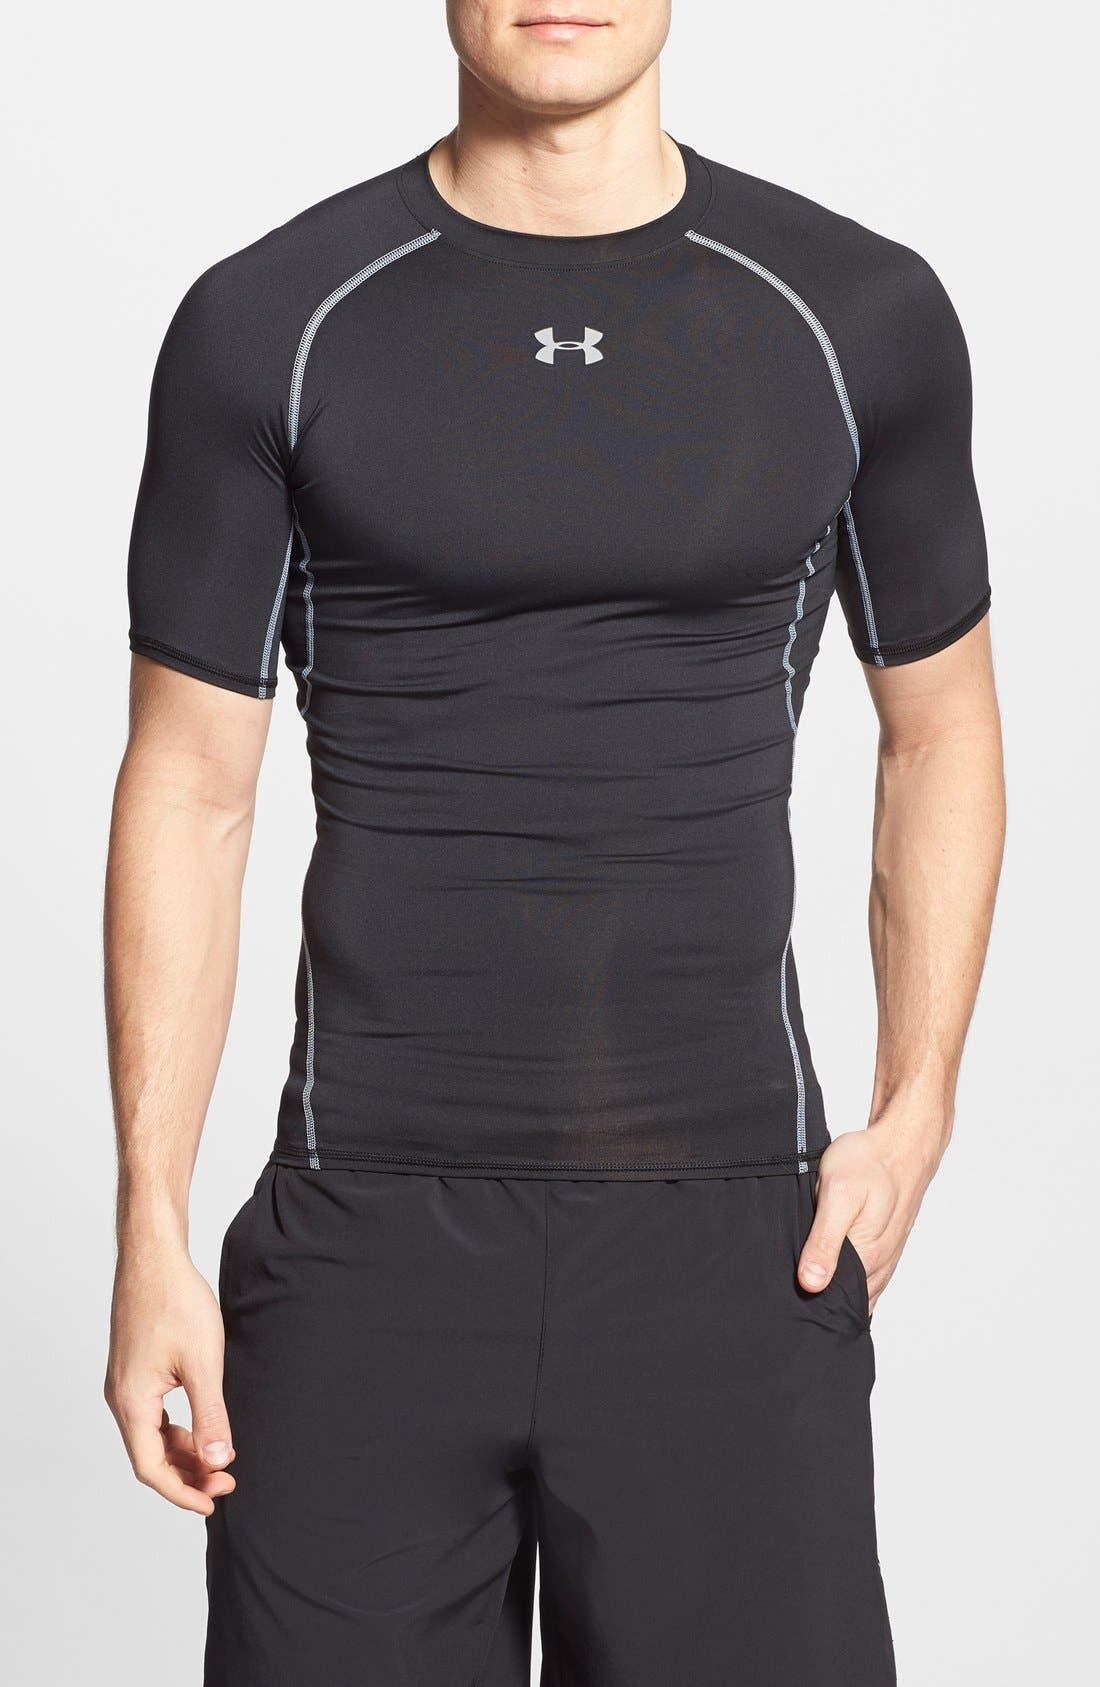 Under Armour Heatgear Compression Fit T-Shirt, Black